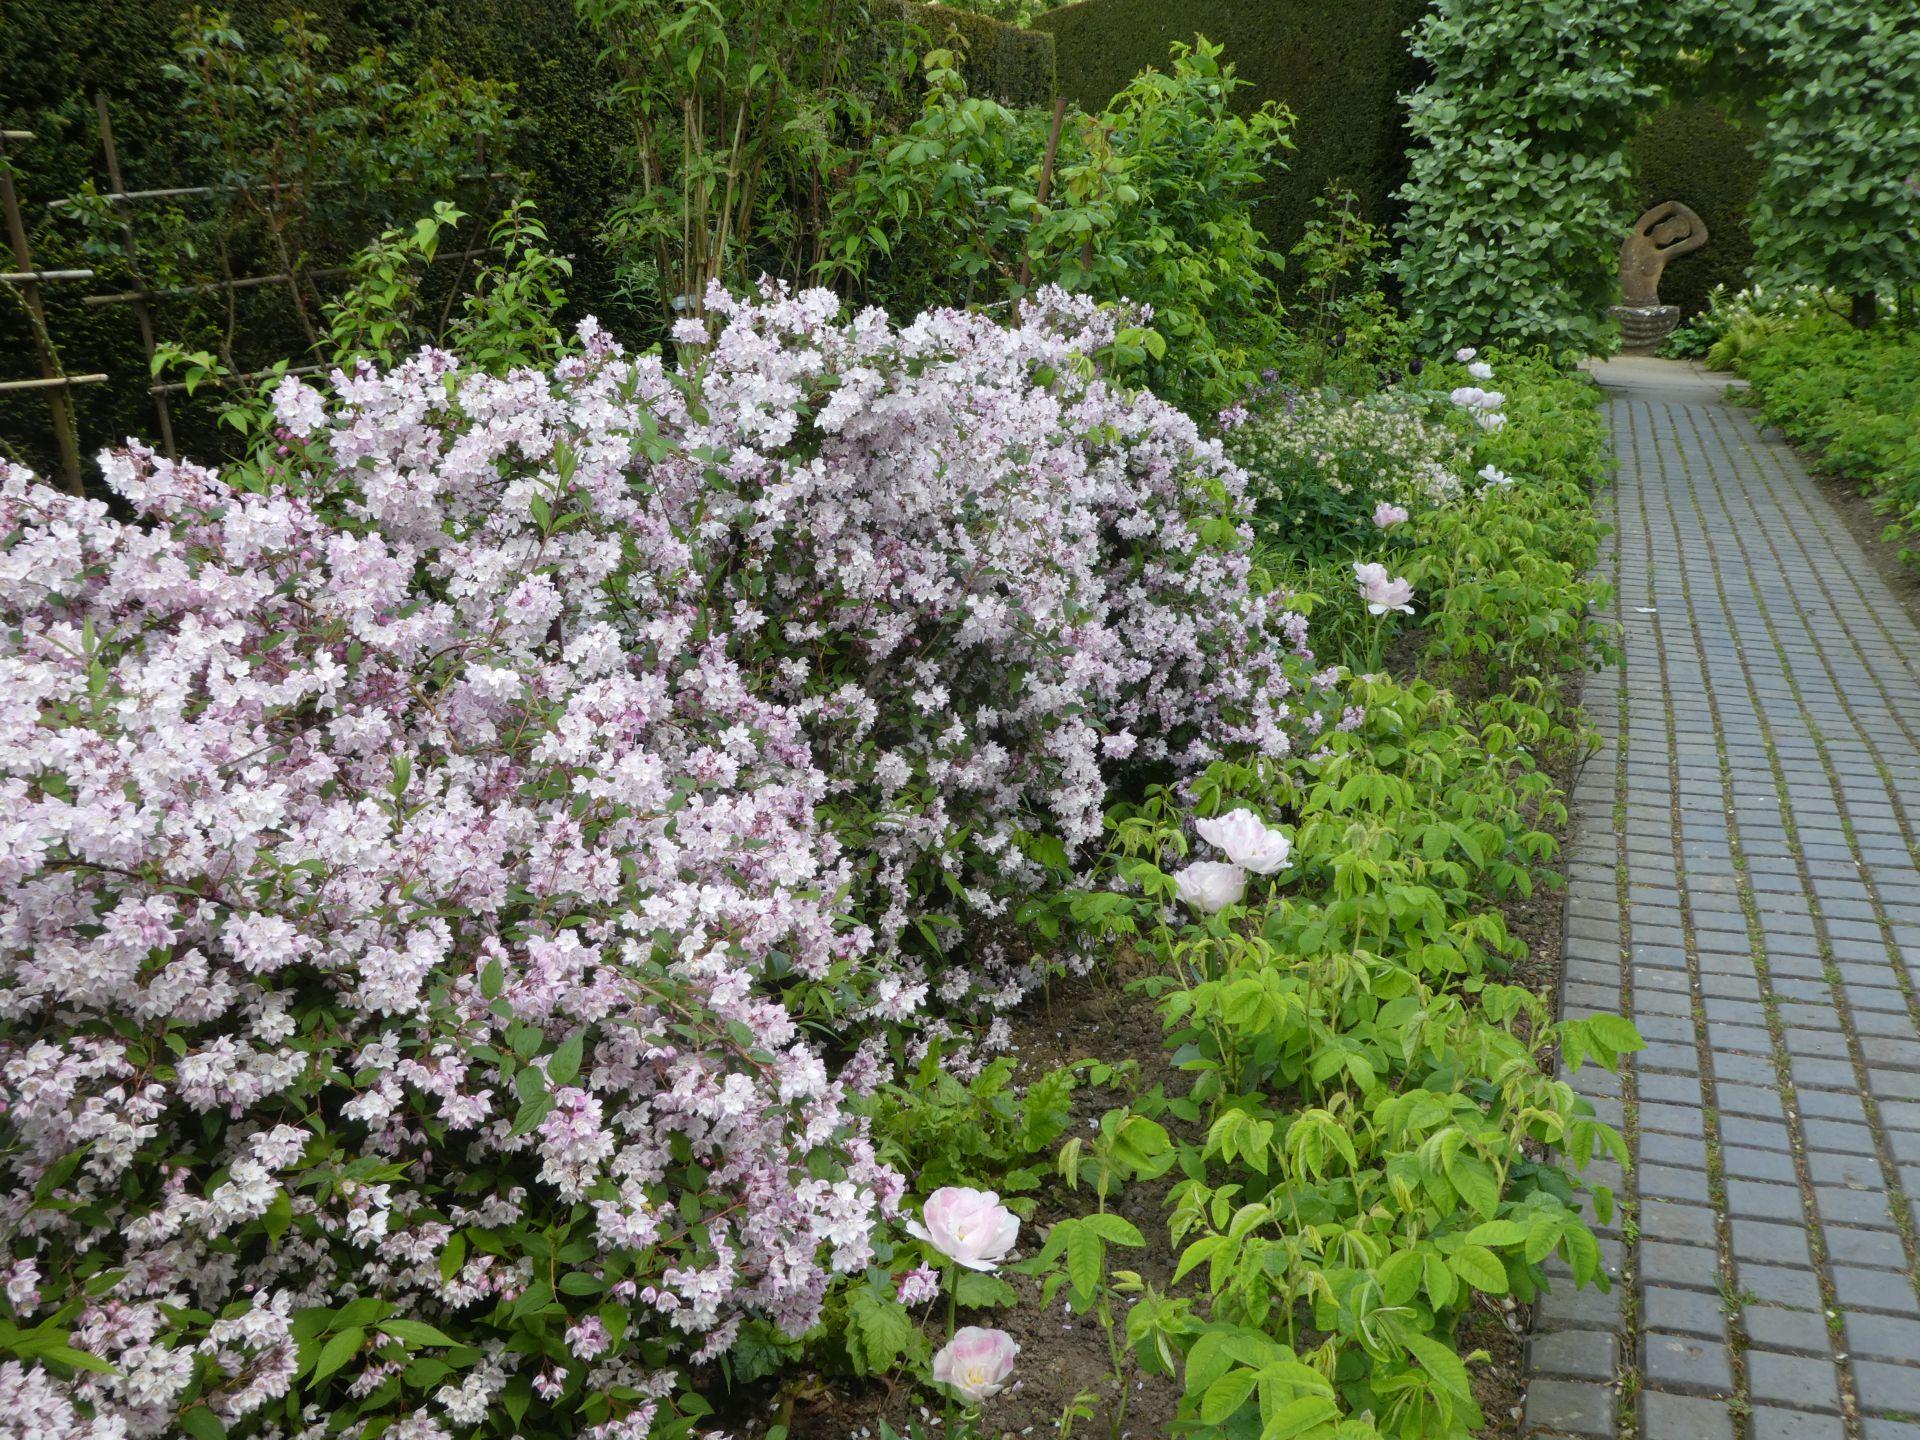 Deutzia x rosea in the Rose Border